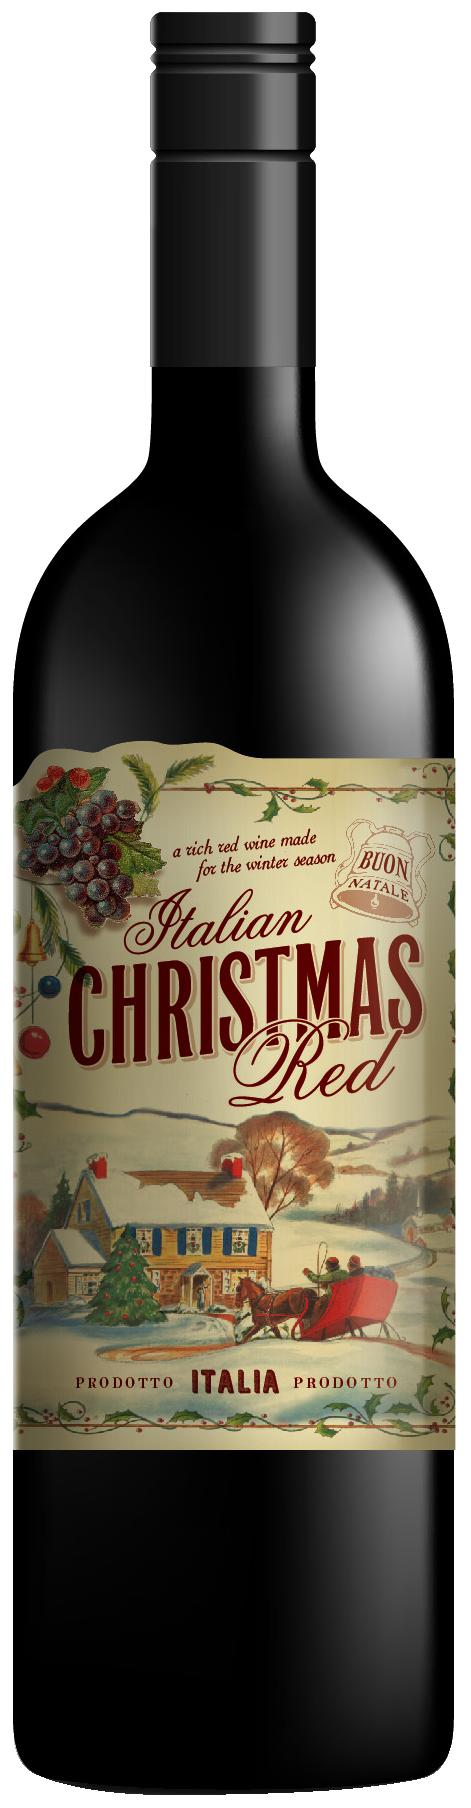 Boglione Christmas Red